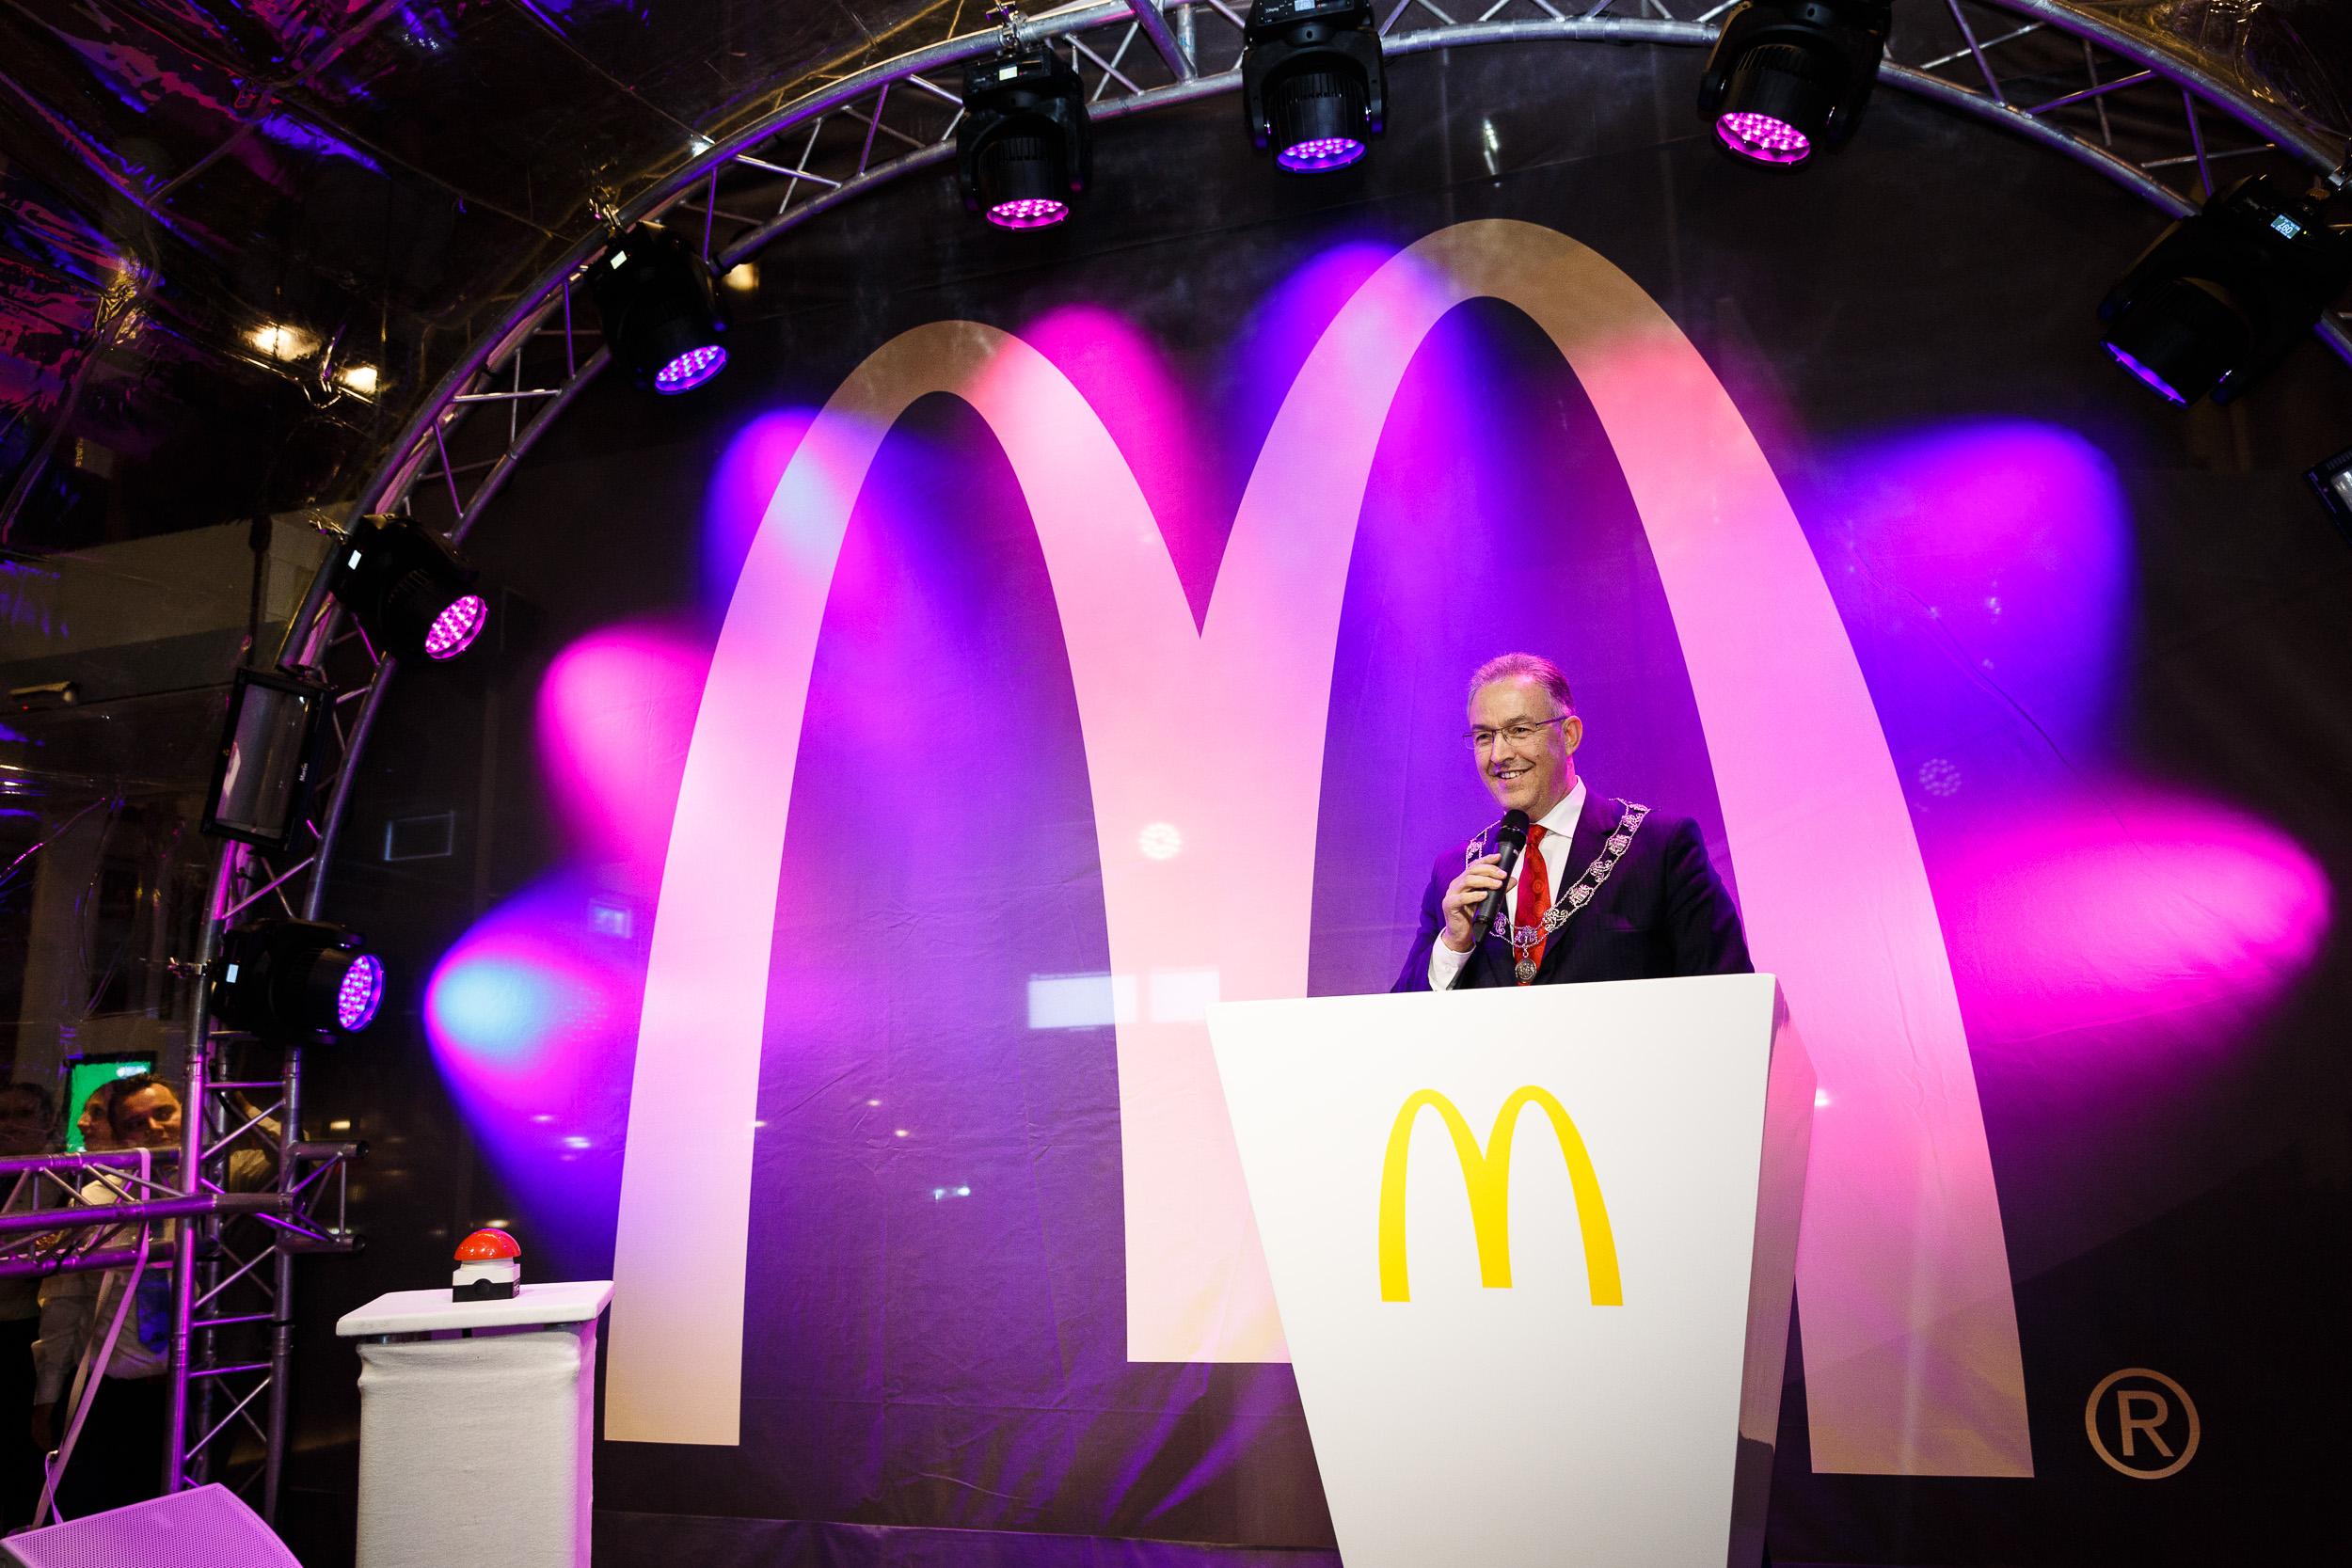 20150327 McDonalds Coolsingel opening 09.jpg